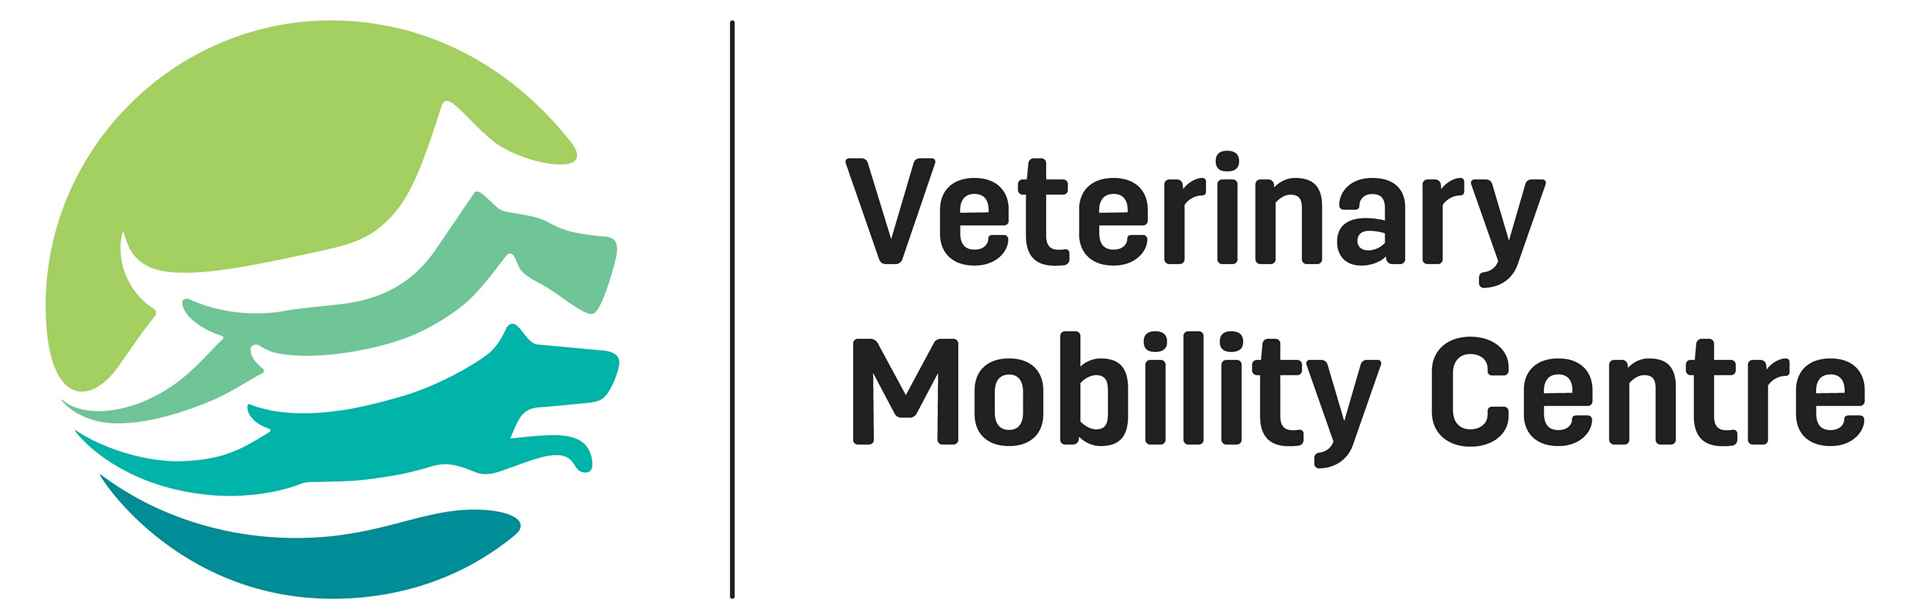 Veterinary Mobility Center